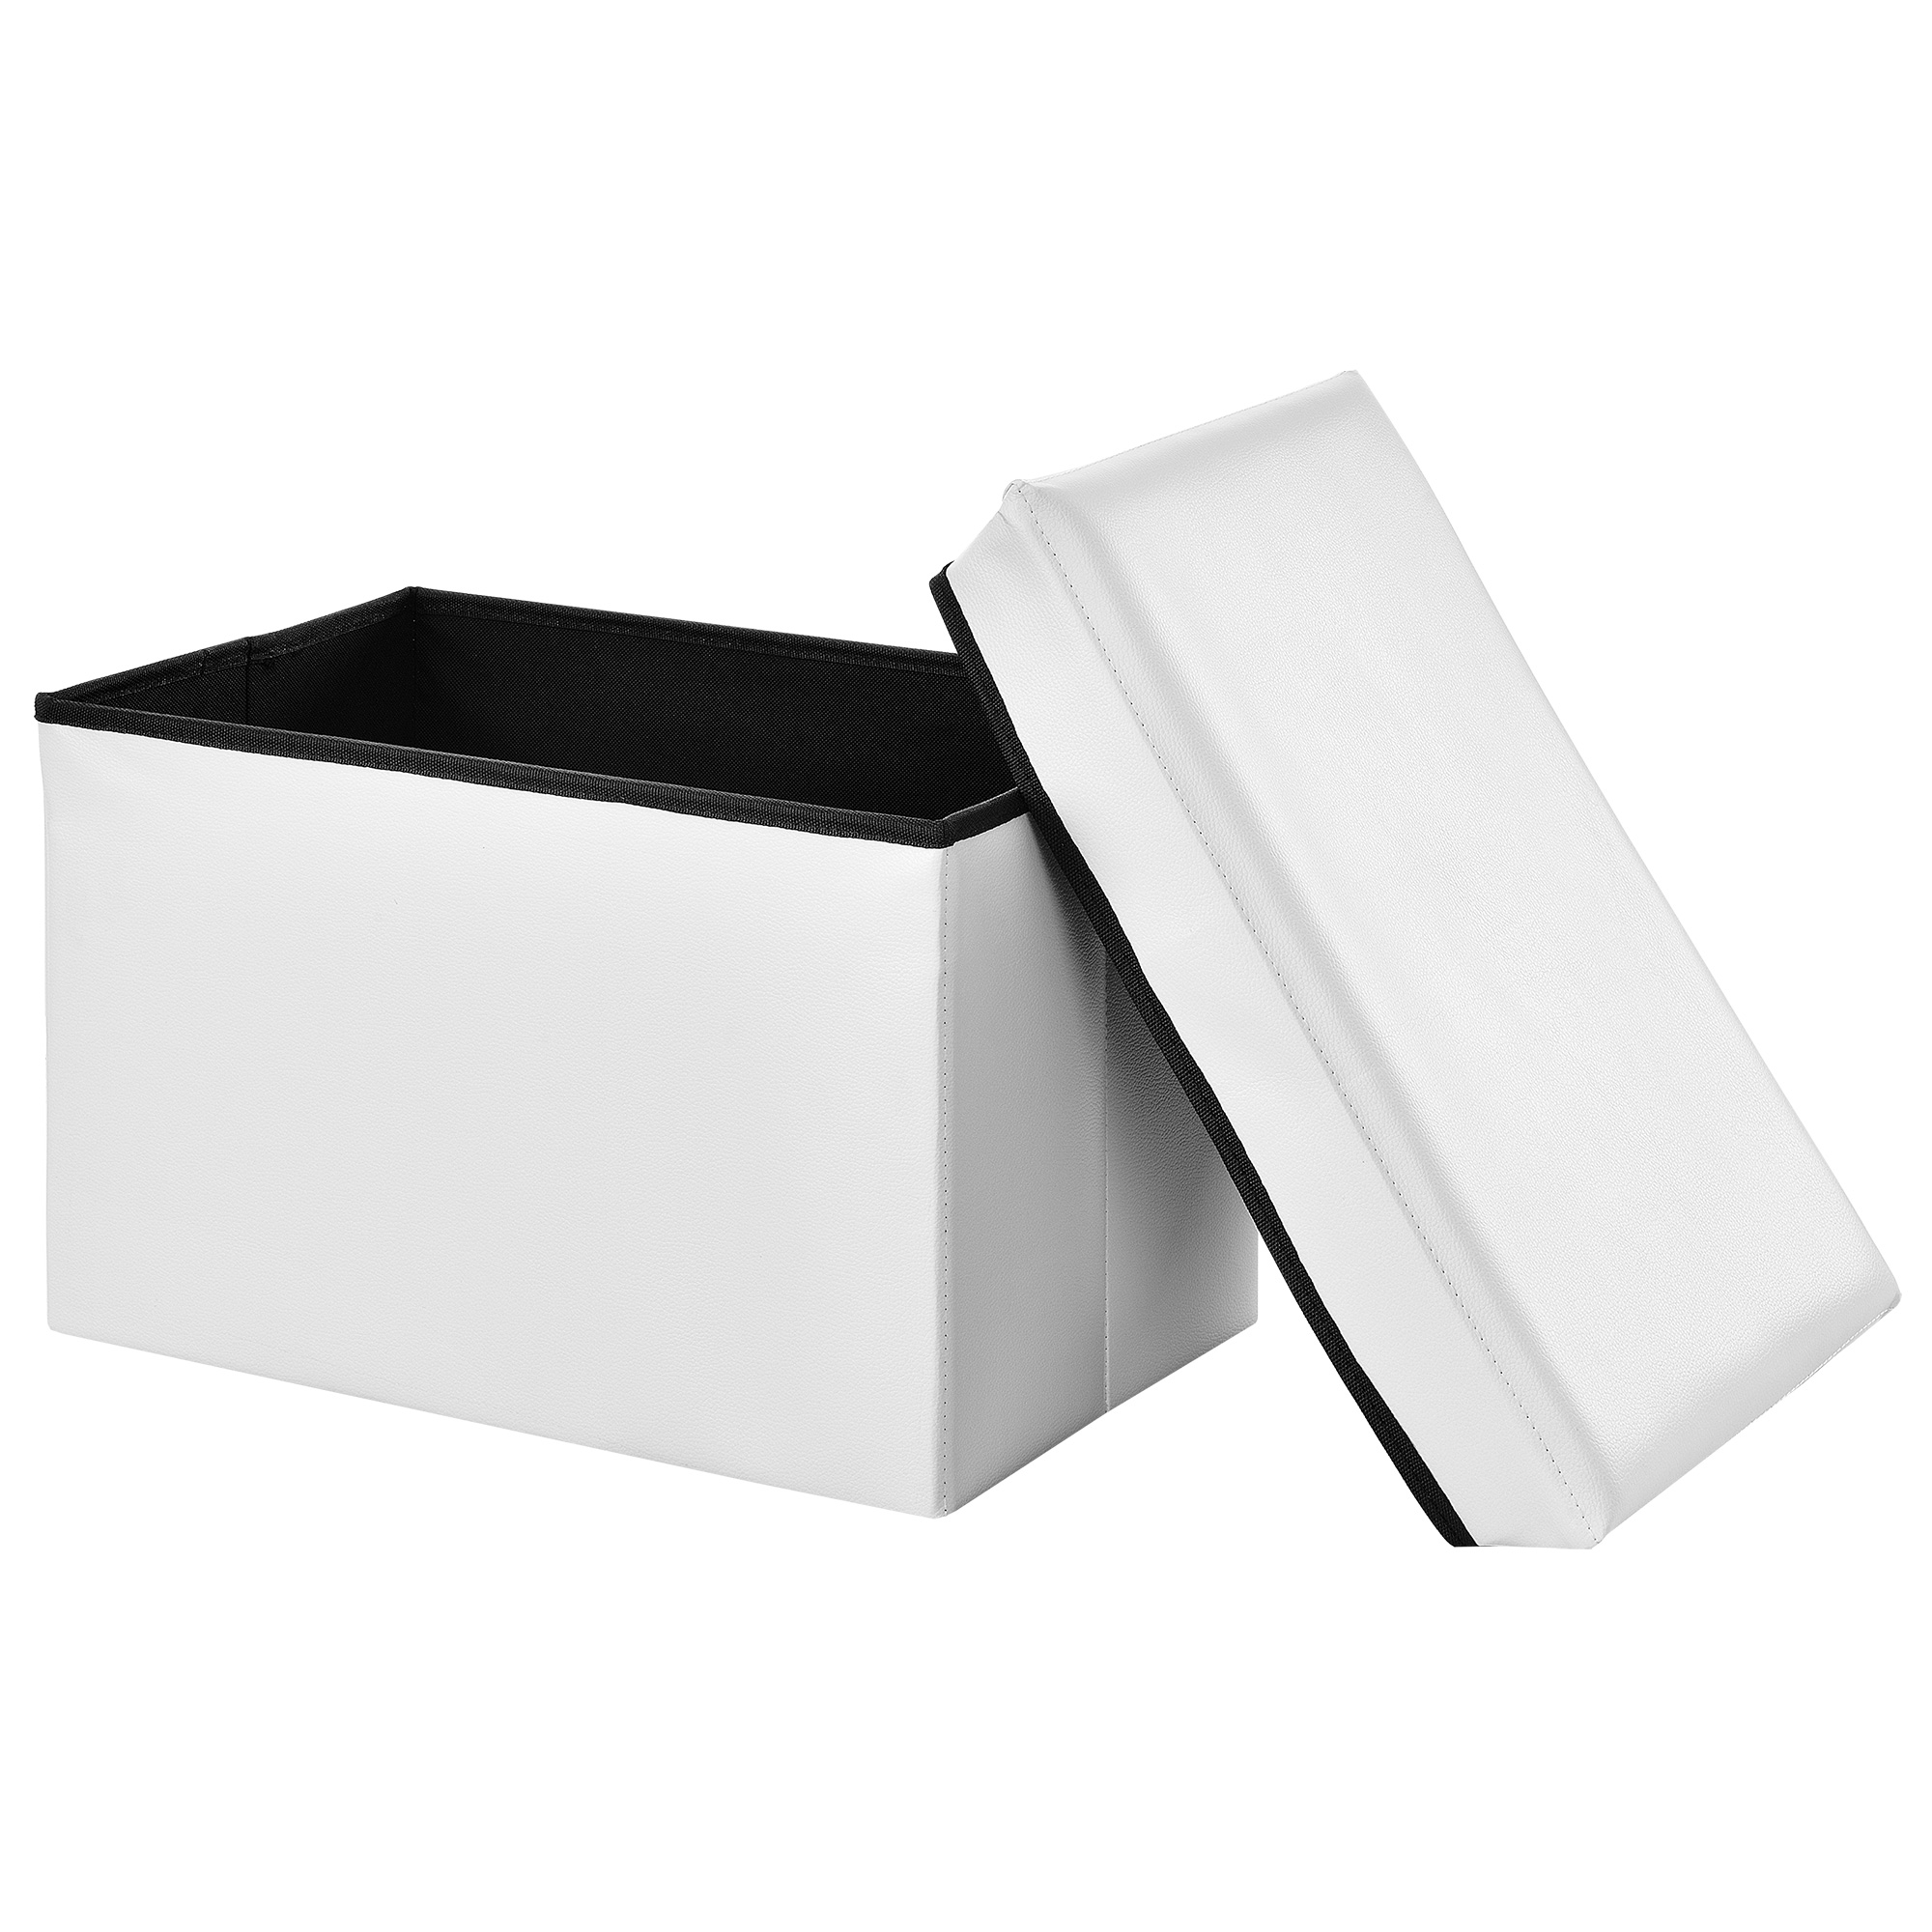 sitzhocker wei 48x31x31cm sitz bank. Black Bedroom Furniture Sets. Home Design Ideas